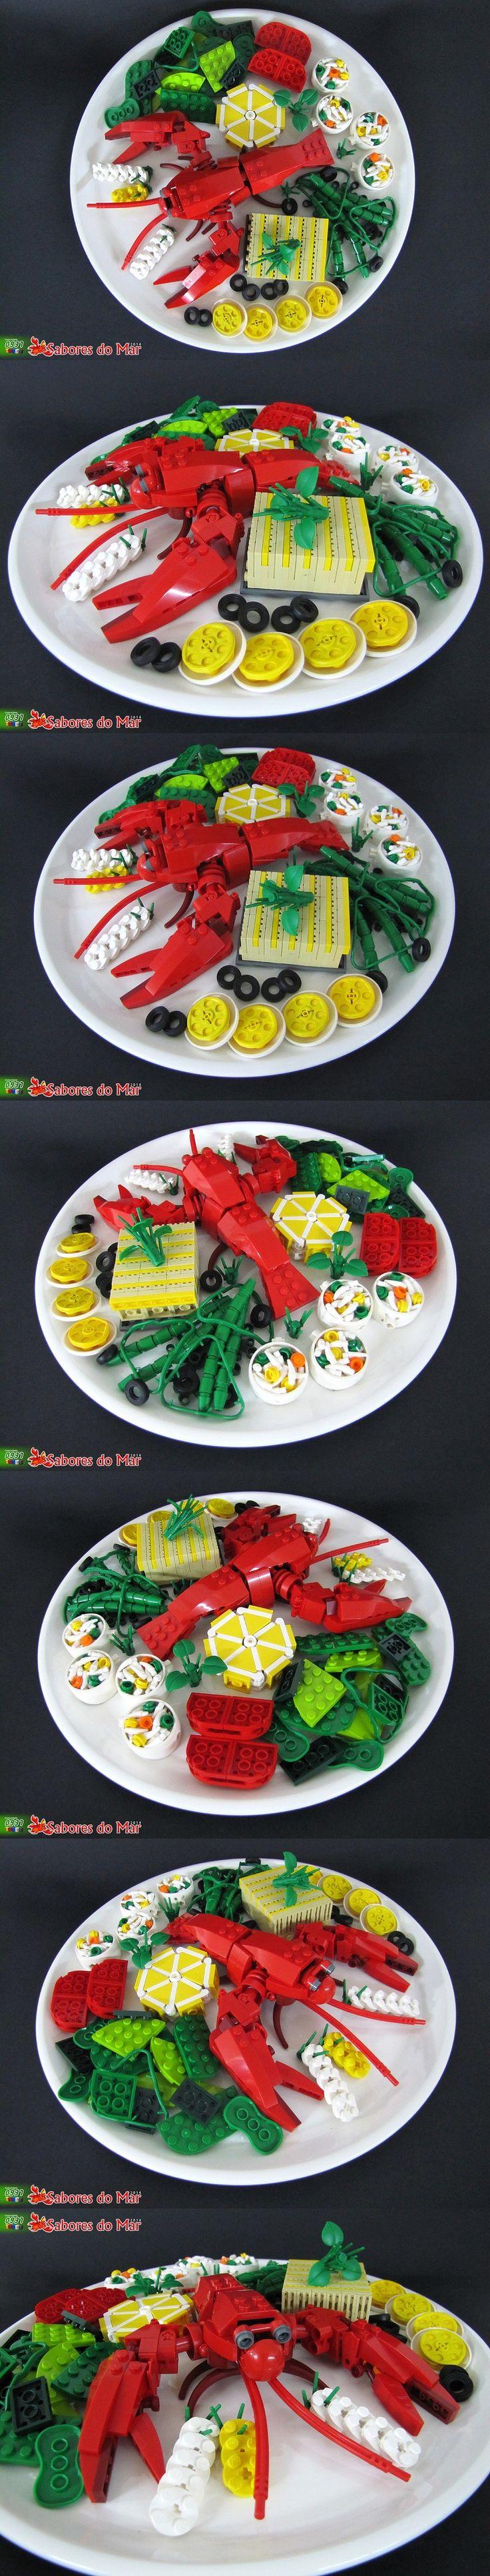 Lego food by Filipe Alves on Flickr